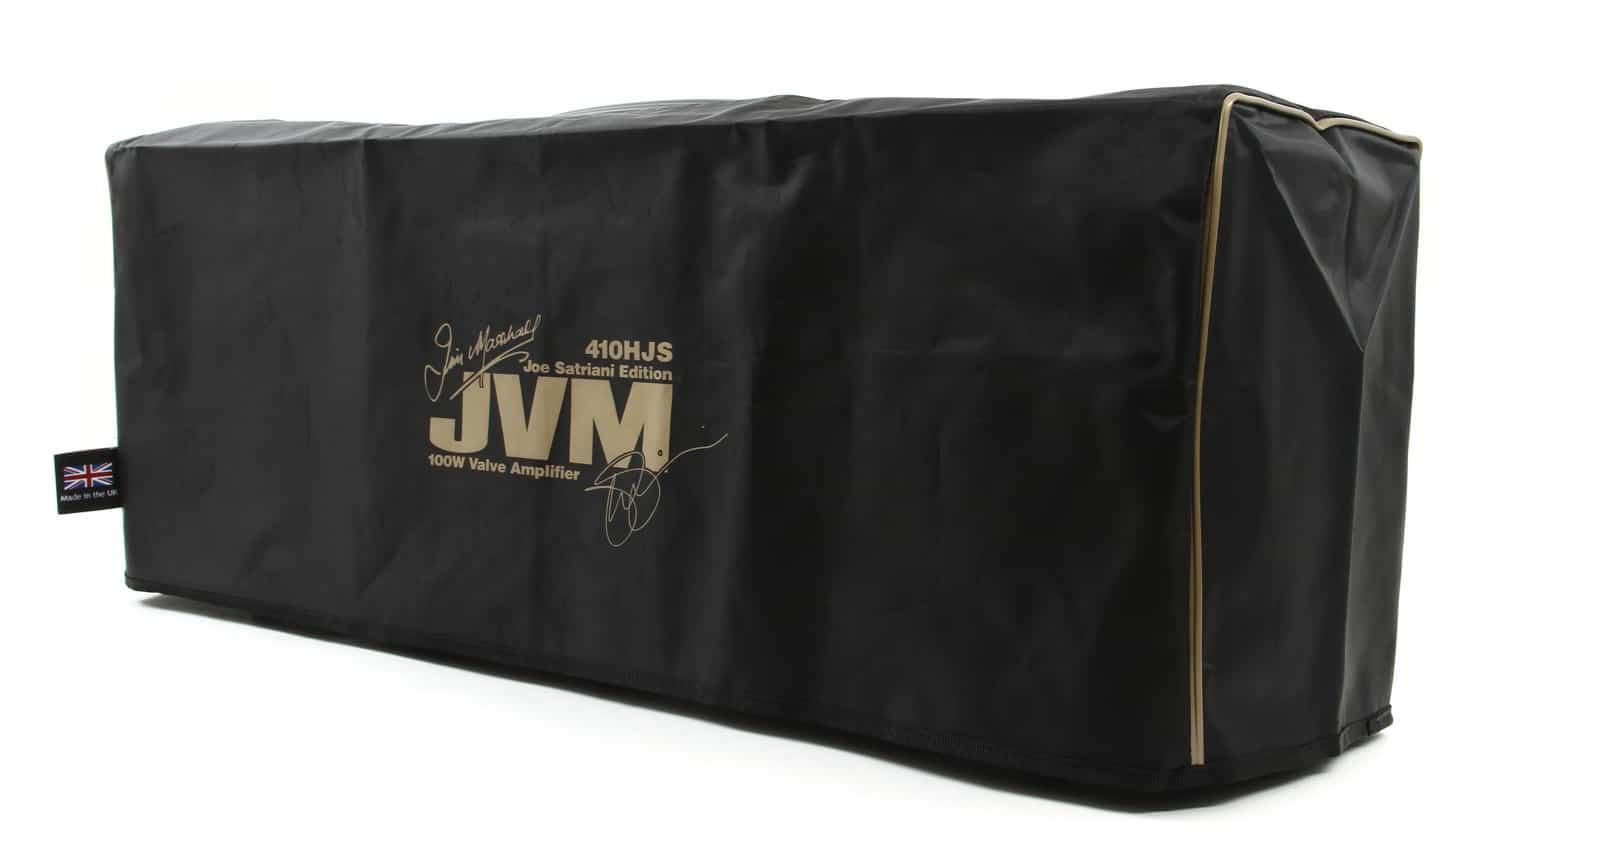 marshall-jvm410hjs-cover